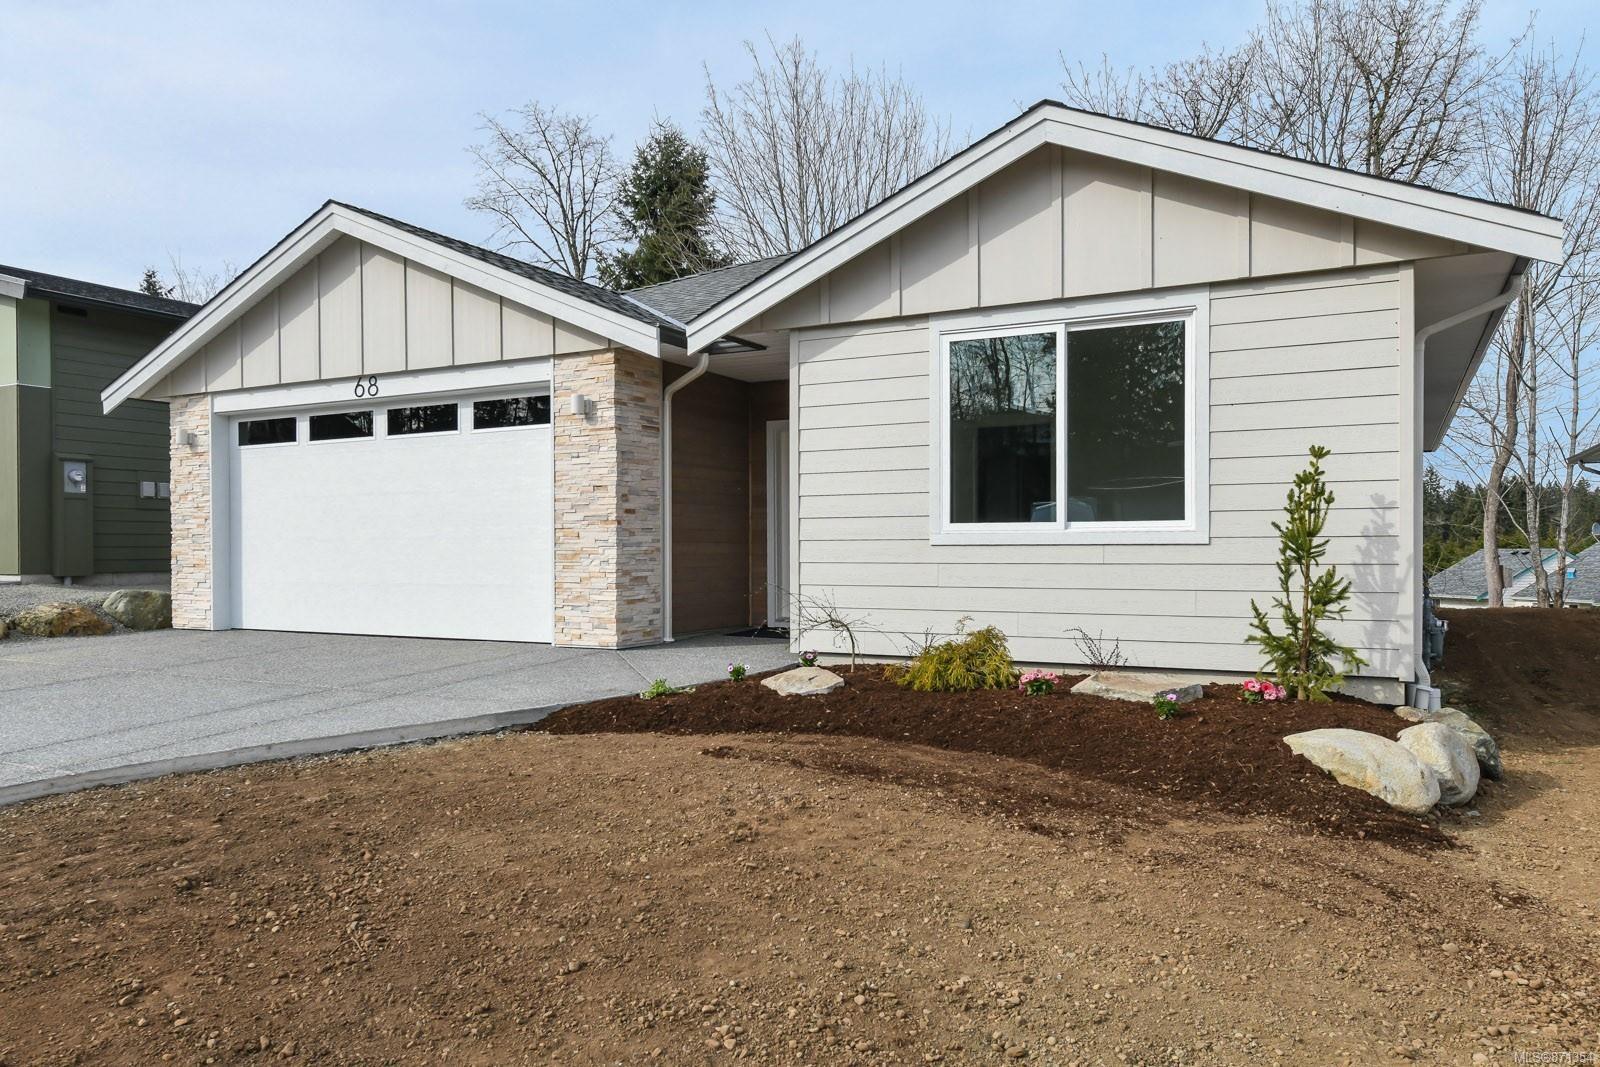 Photo 31: Photos: 68 Grayhawk Pl in : CV Courtenay City House for sale (Comox Valley)  : MLS®# 871354